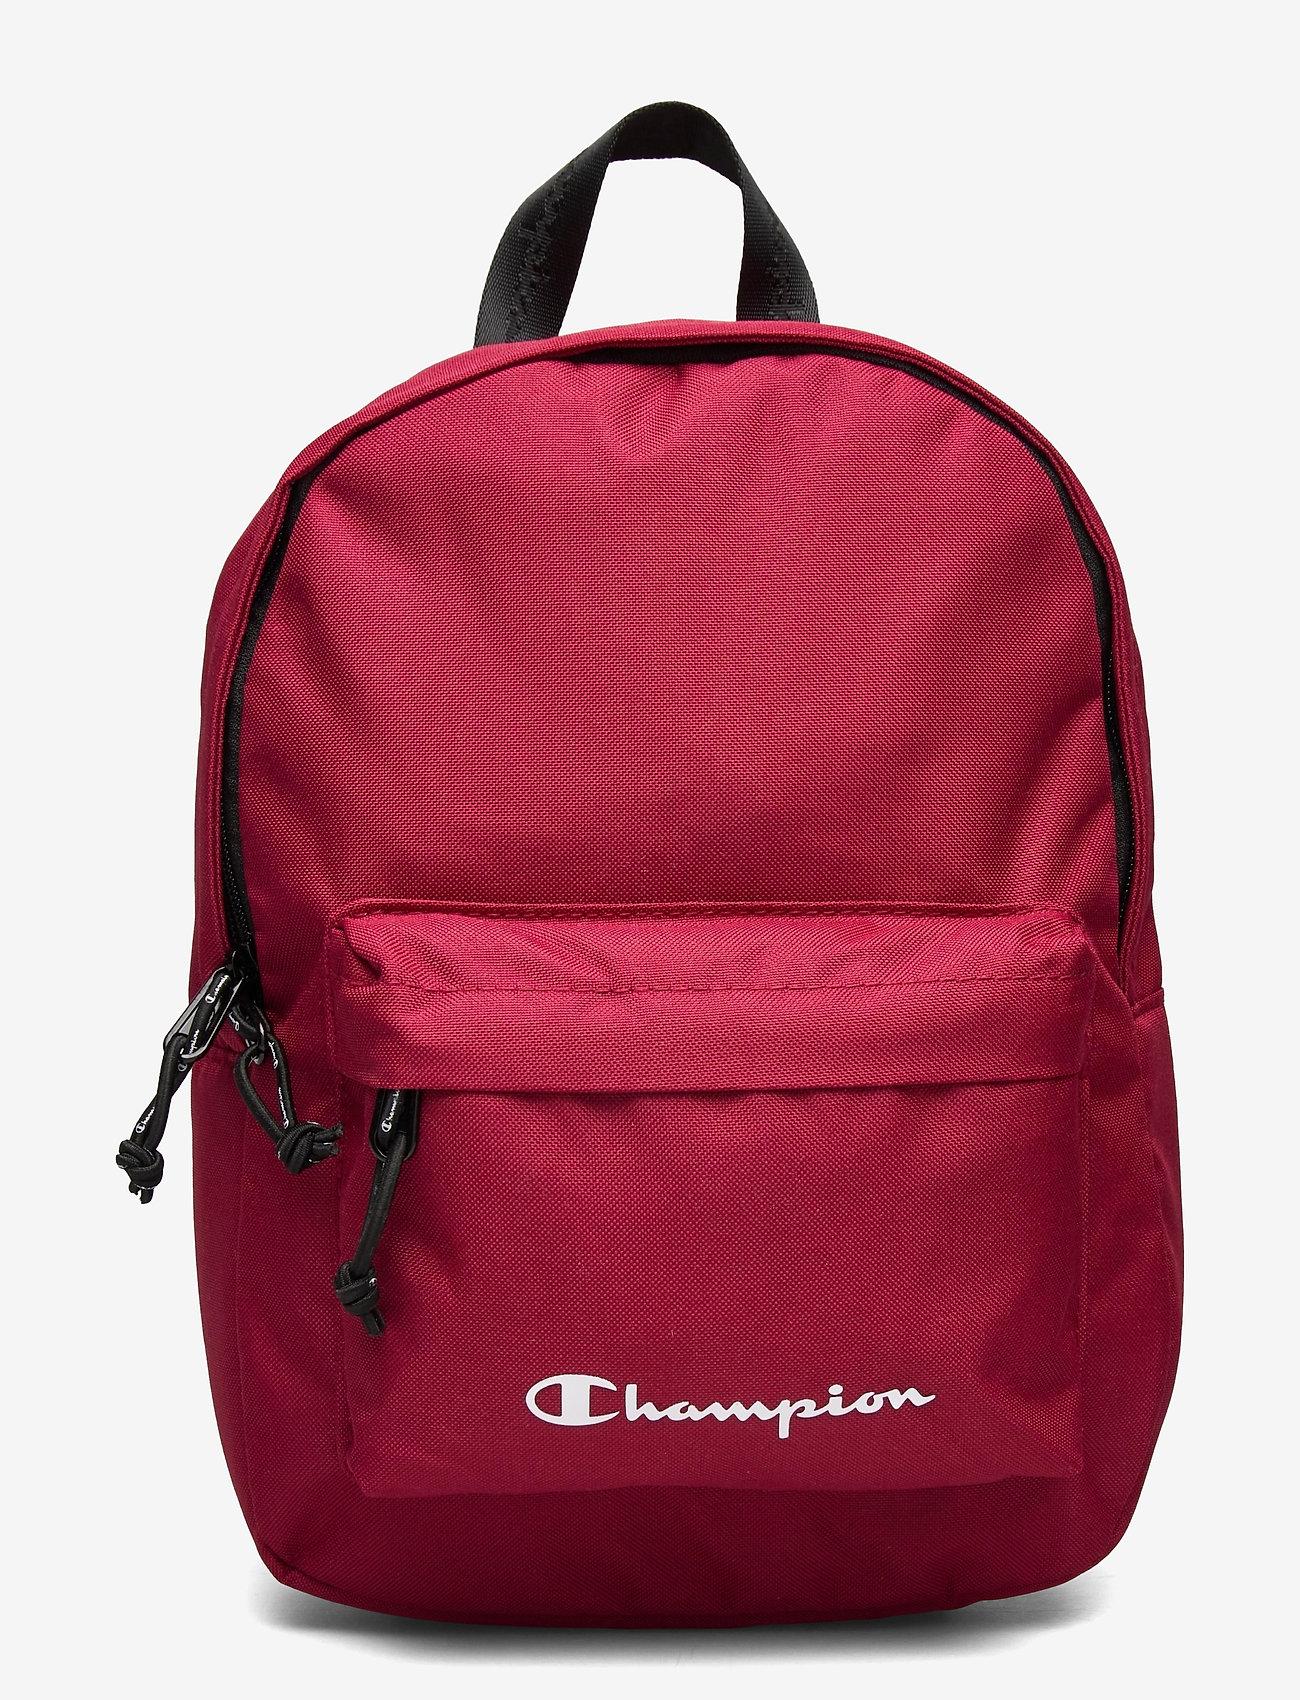 Champion - Small Backpack - treenikassit - rio red - 0